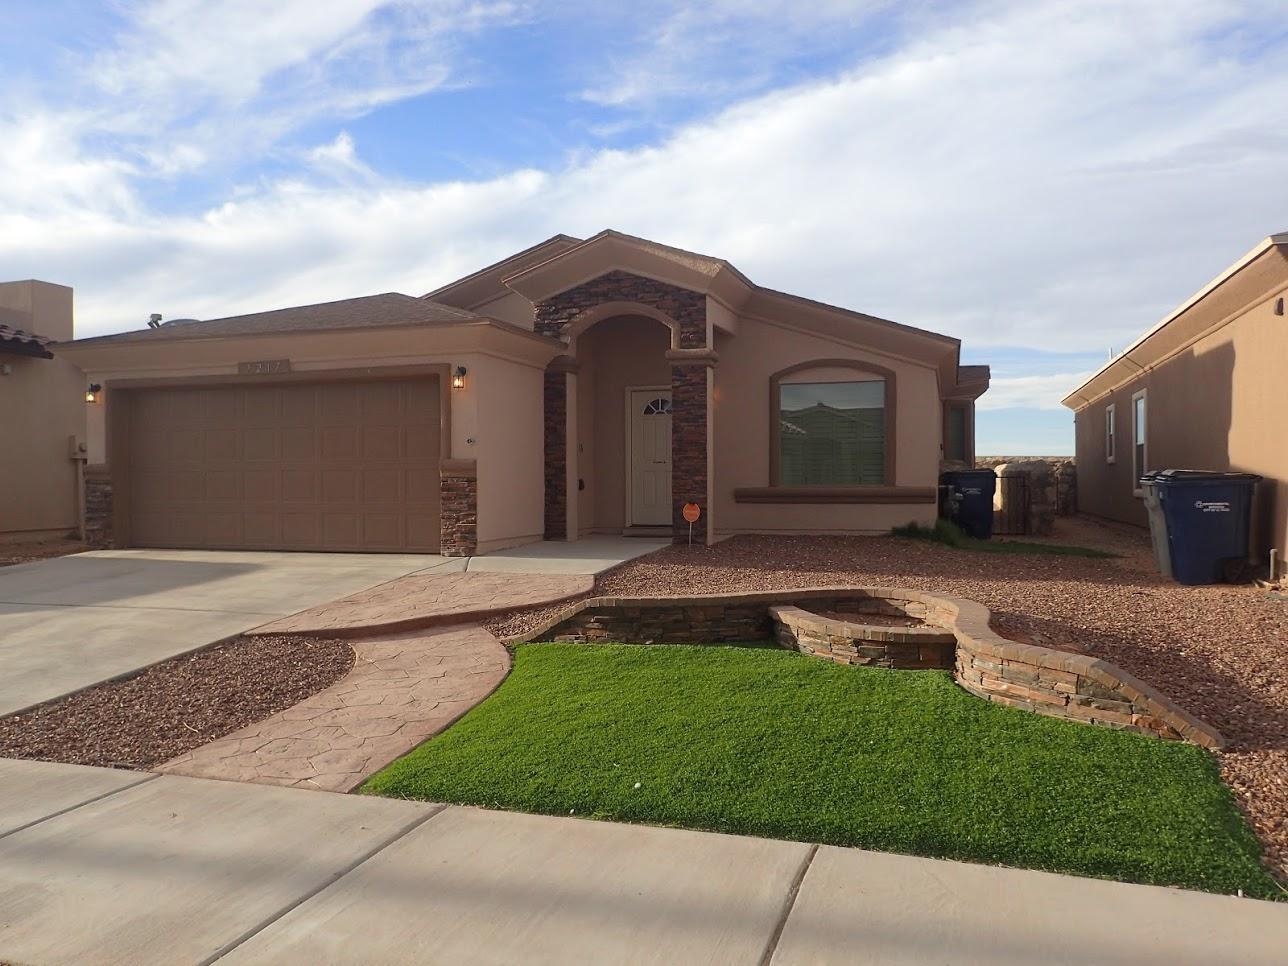 7217 LONG MEADOW, El Paso, Texas 79934, 4 Bedrooms Bedrooms, ,2 BathroomsBathrooms,Residential Rental,For Rent,LONG MEADOW,816302